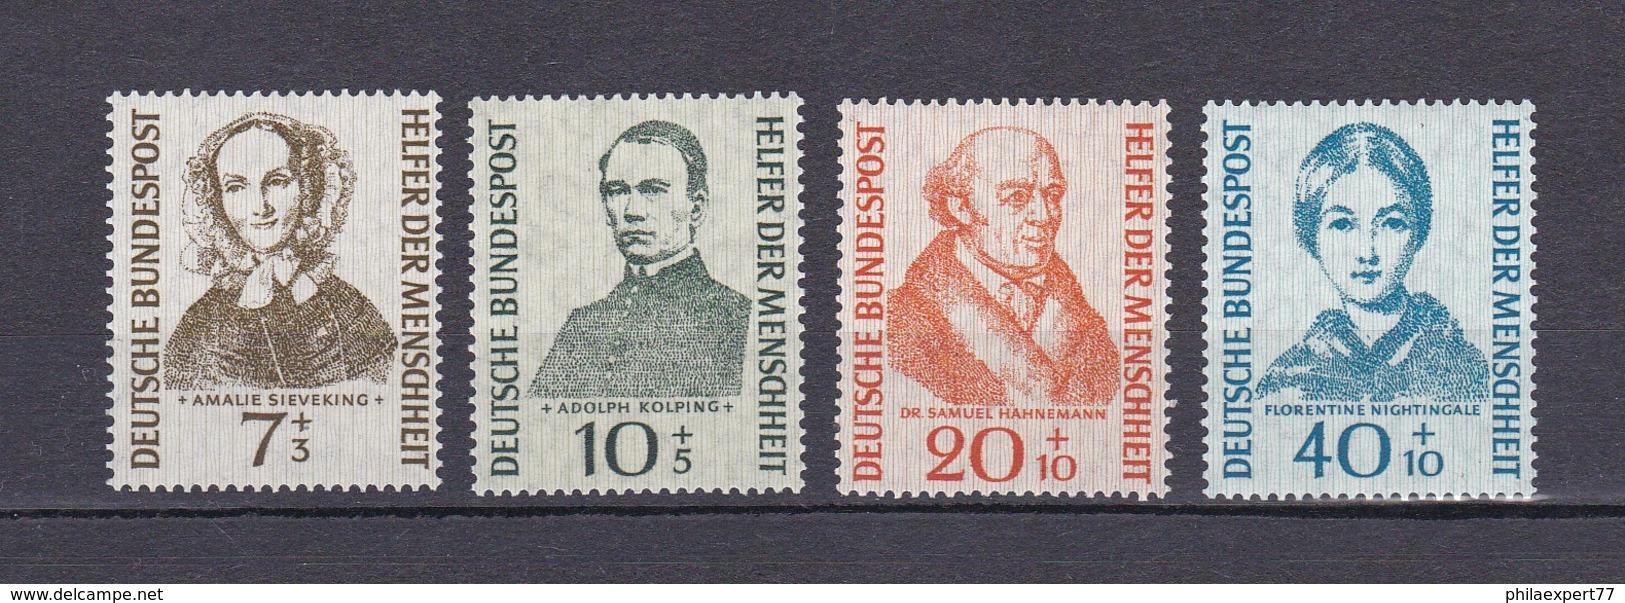 BRD - 1955 - Michel Nr. 222/225 - Postfrisch - 40 Euro - BRD